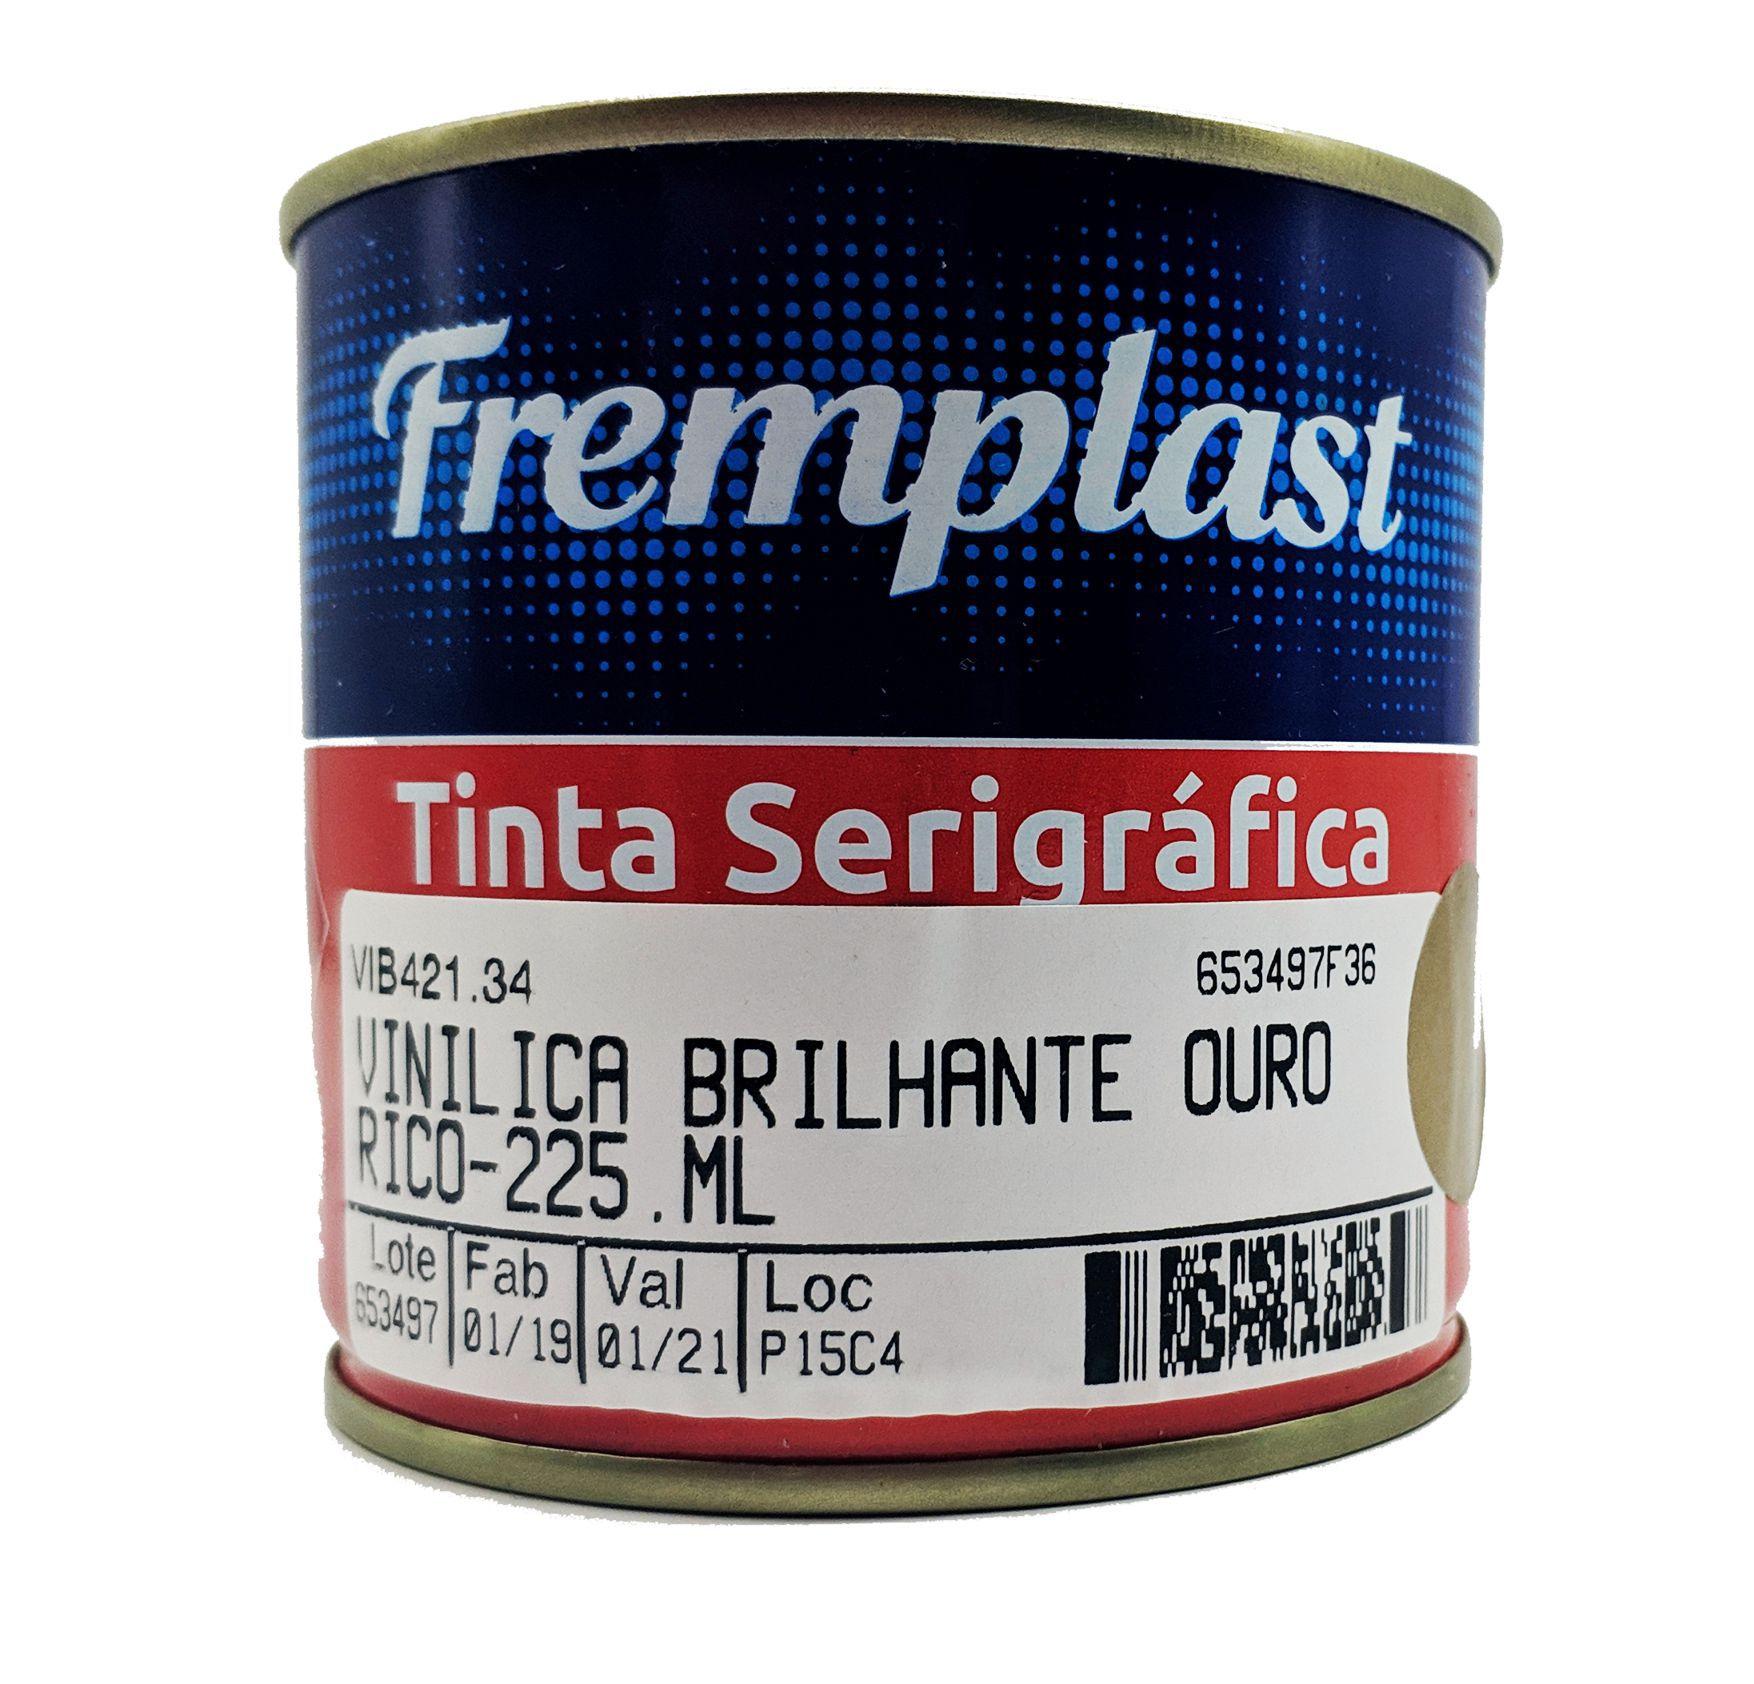 TINTA VINILICA BRILHANTE OURO RICO - 225 ml